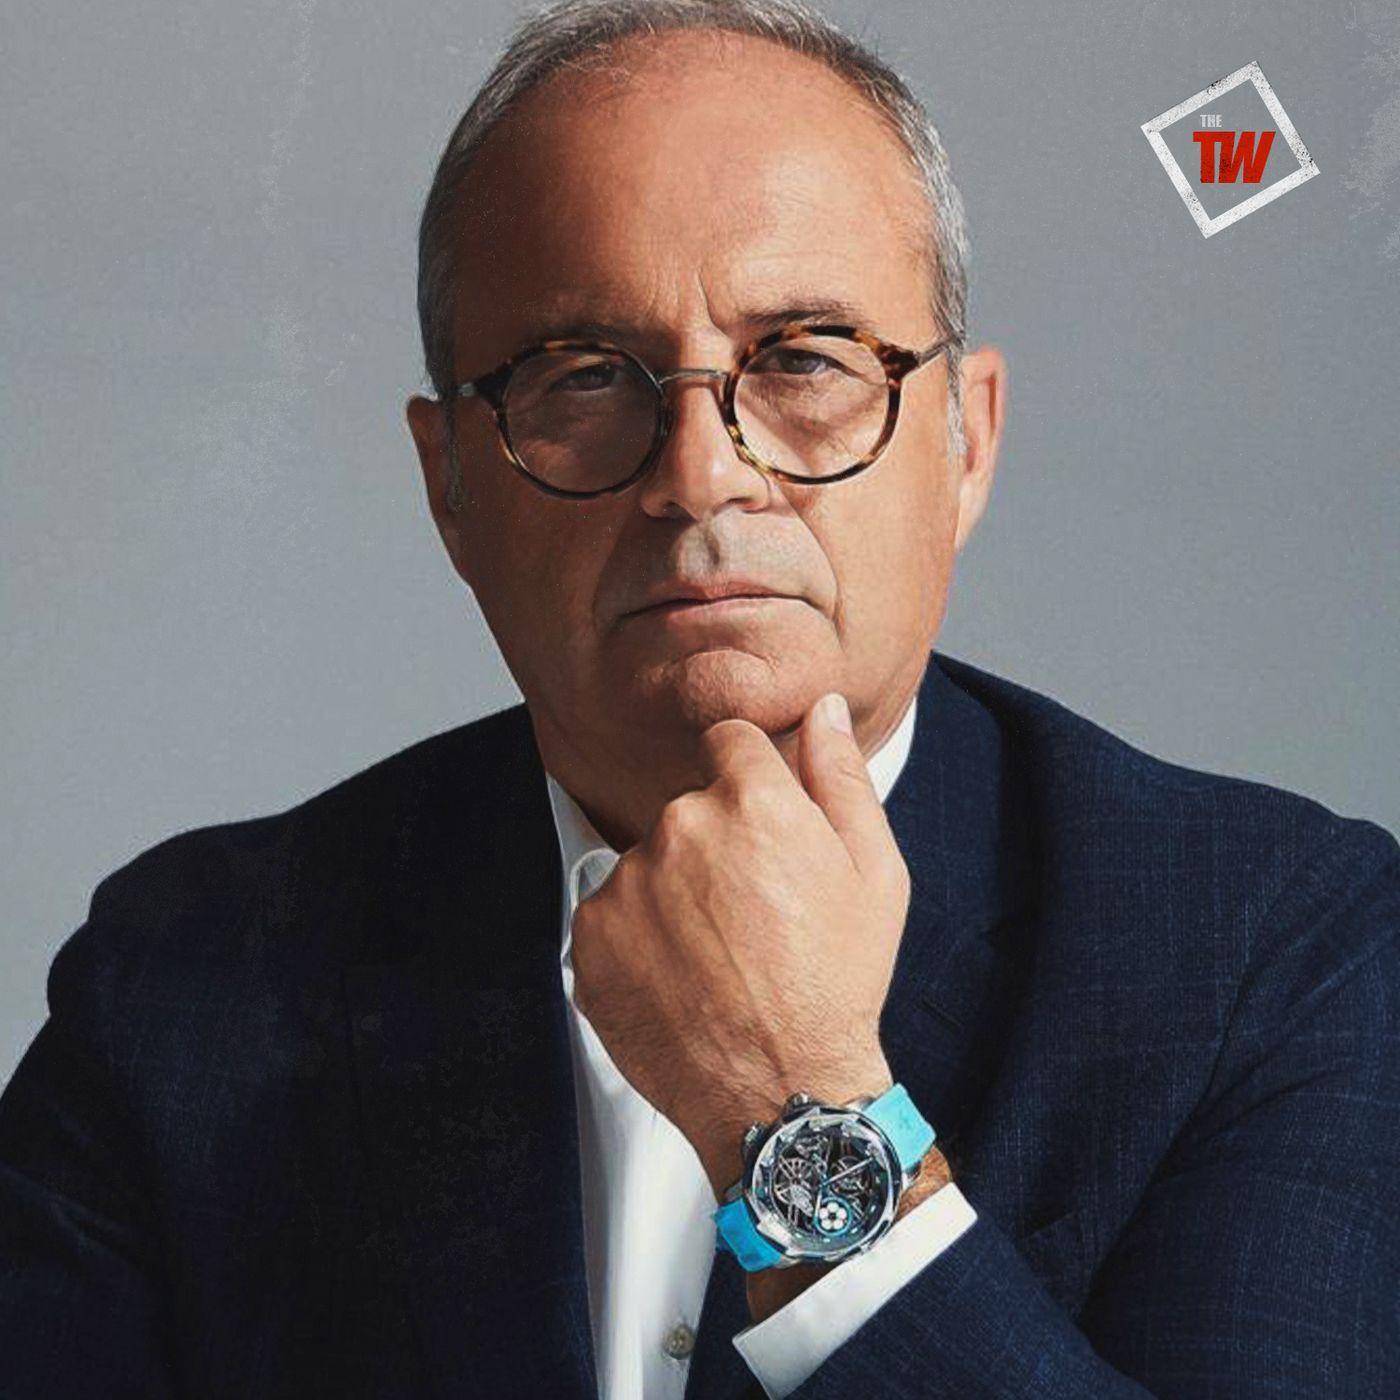 EXCLUSIVE INTERVIEW: Luis Campos, football's billion Euro technical director